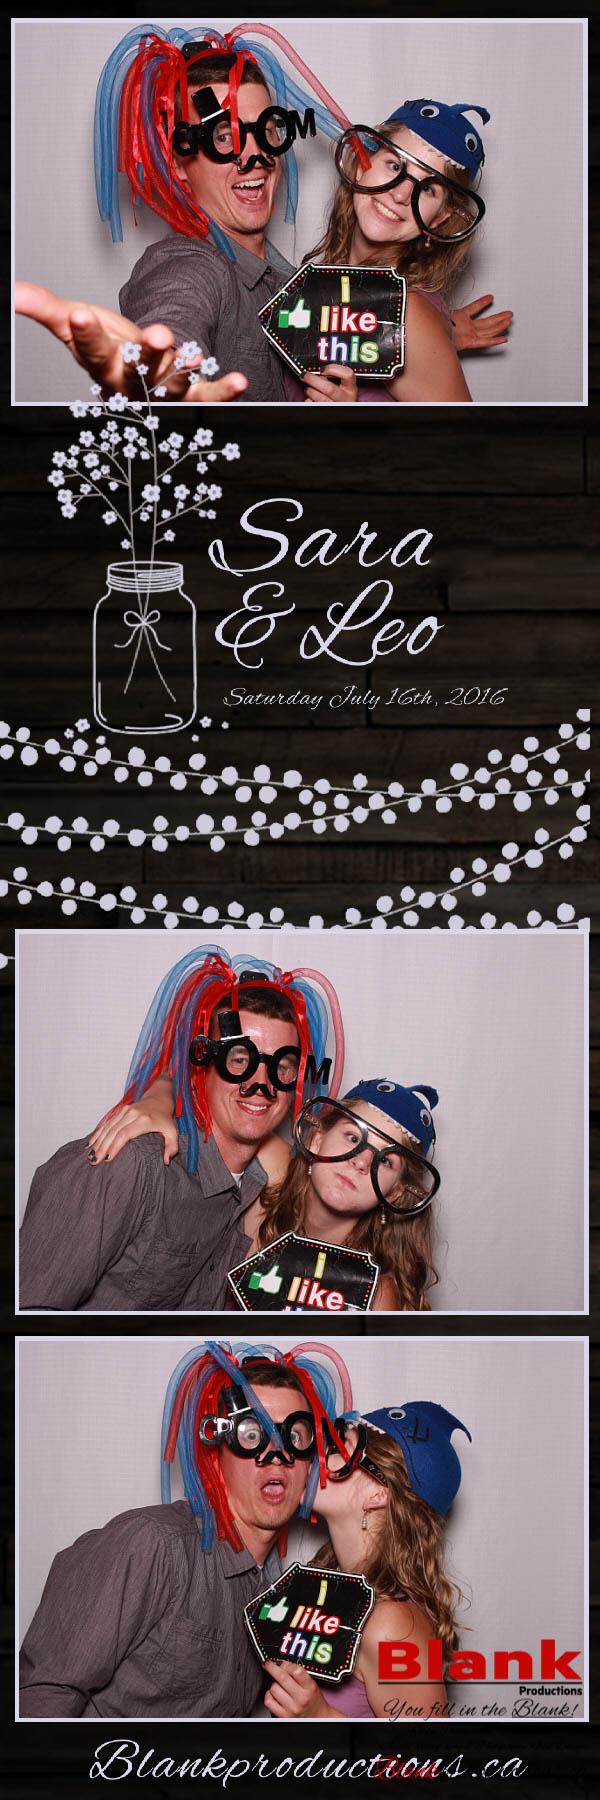 Leo and Sara Strips (91 of 102)